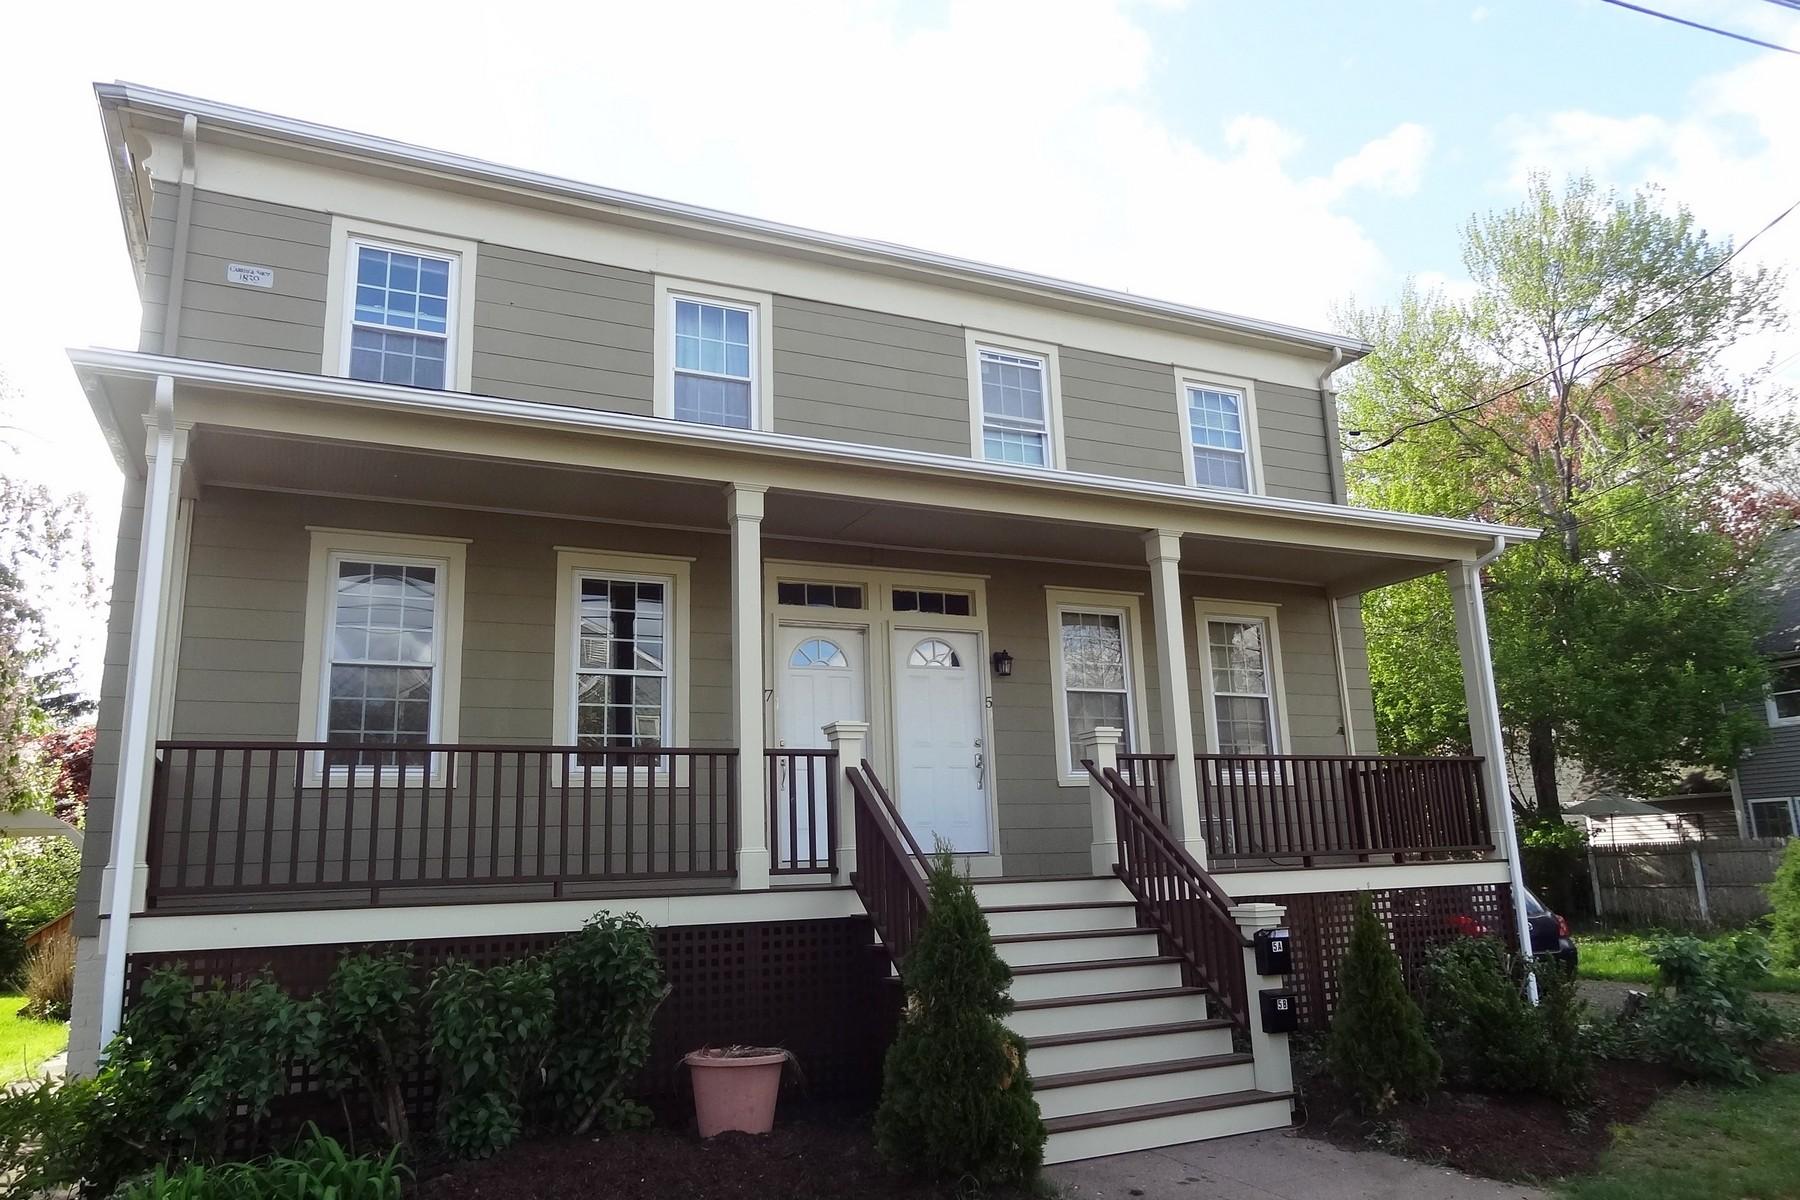 için Satış at A Piece of Black Rock History: 1839 Three Unit Home 5-7 Calderwood Court Bridgeport, Connecticut 06605 Amerika Birleşik Devletleri